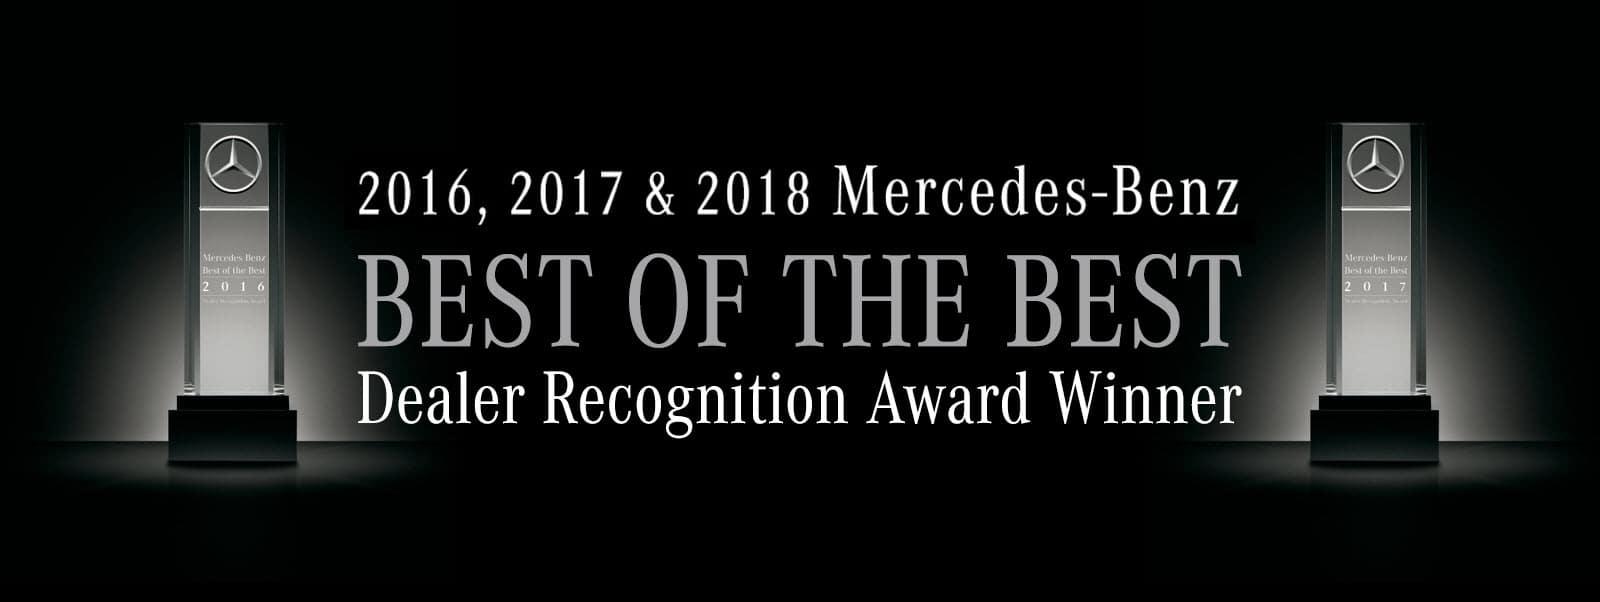 Mercedes-Benz Best of the Best Award